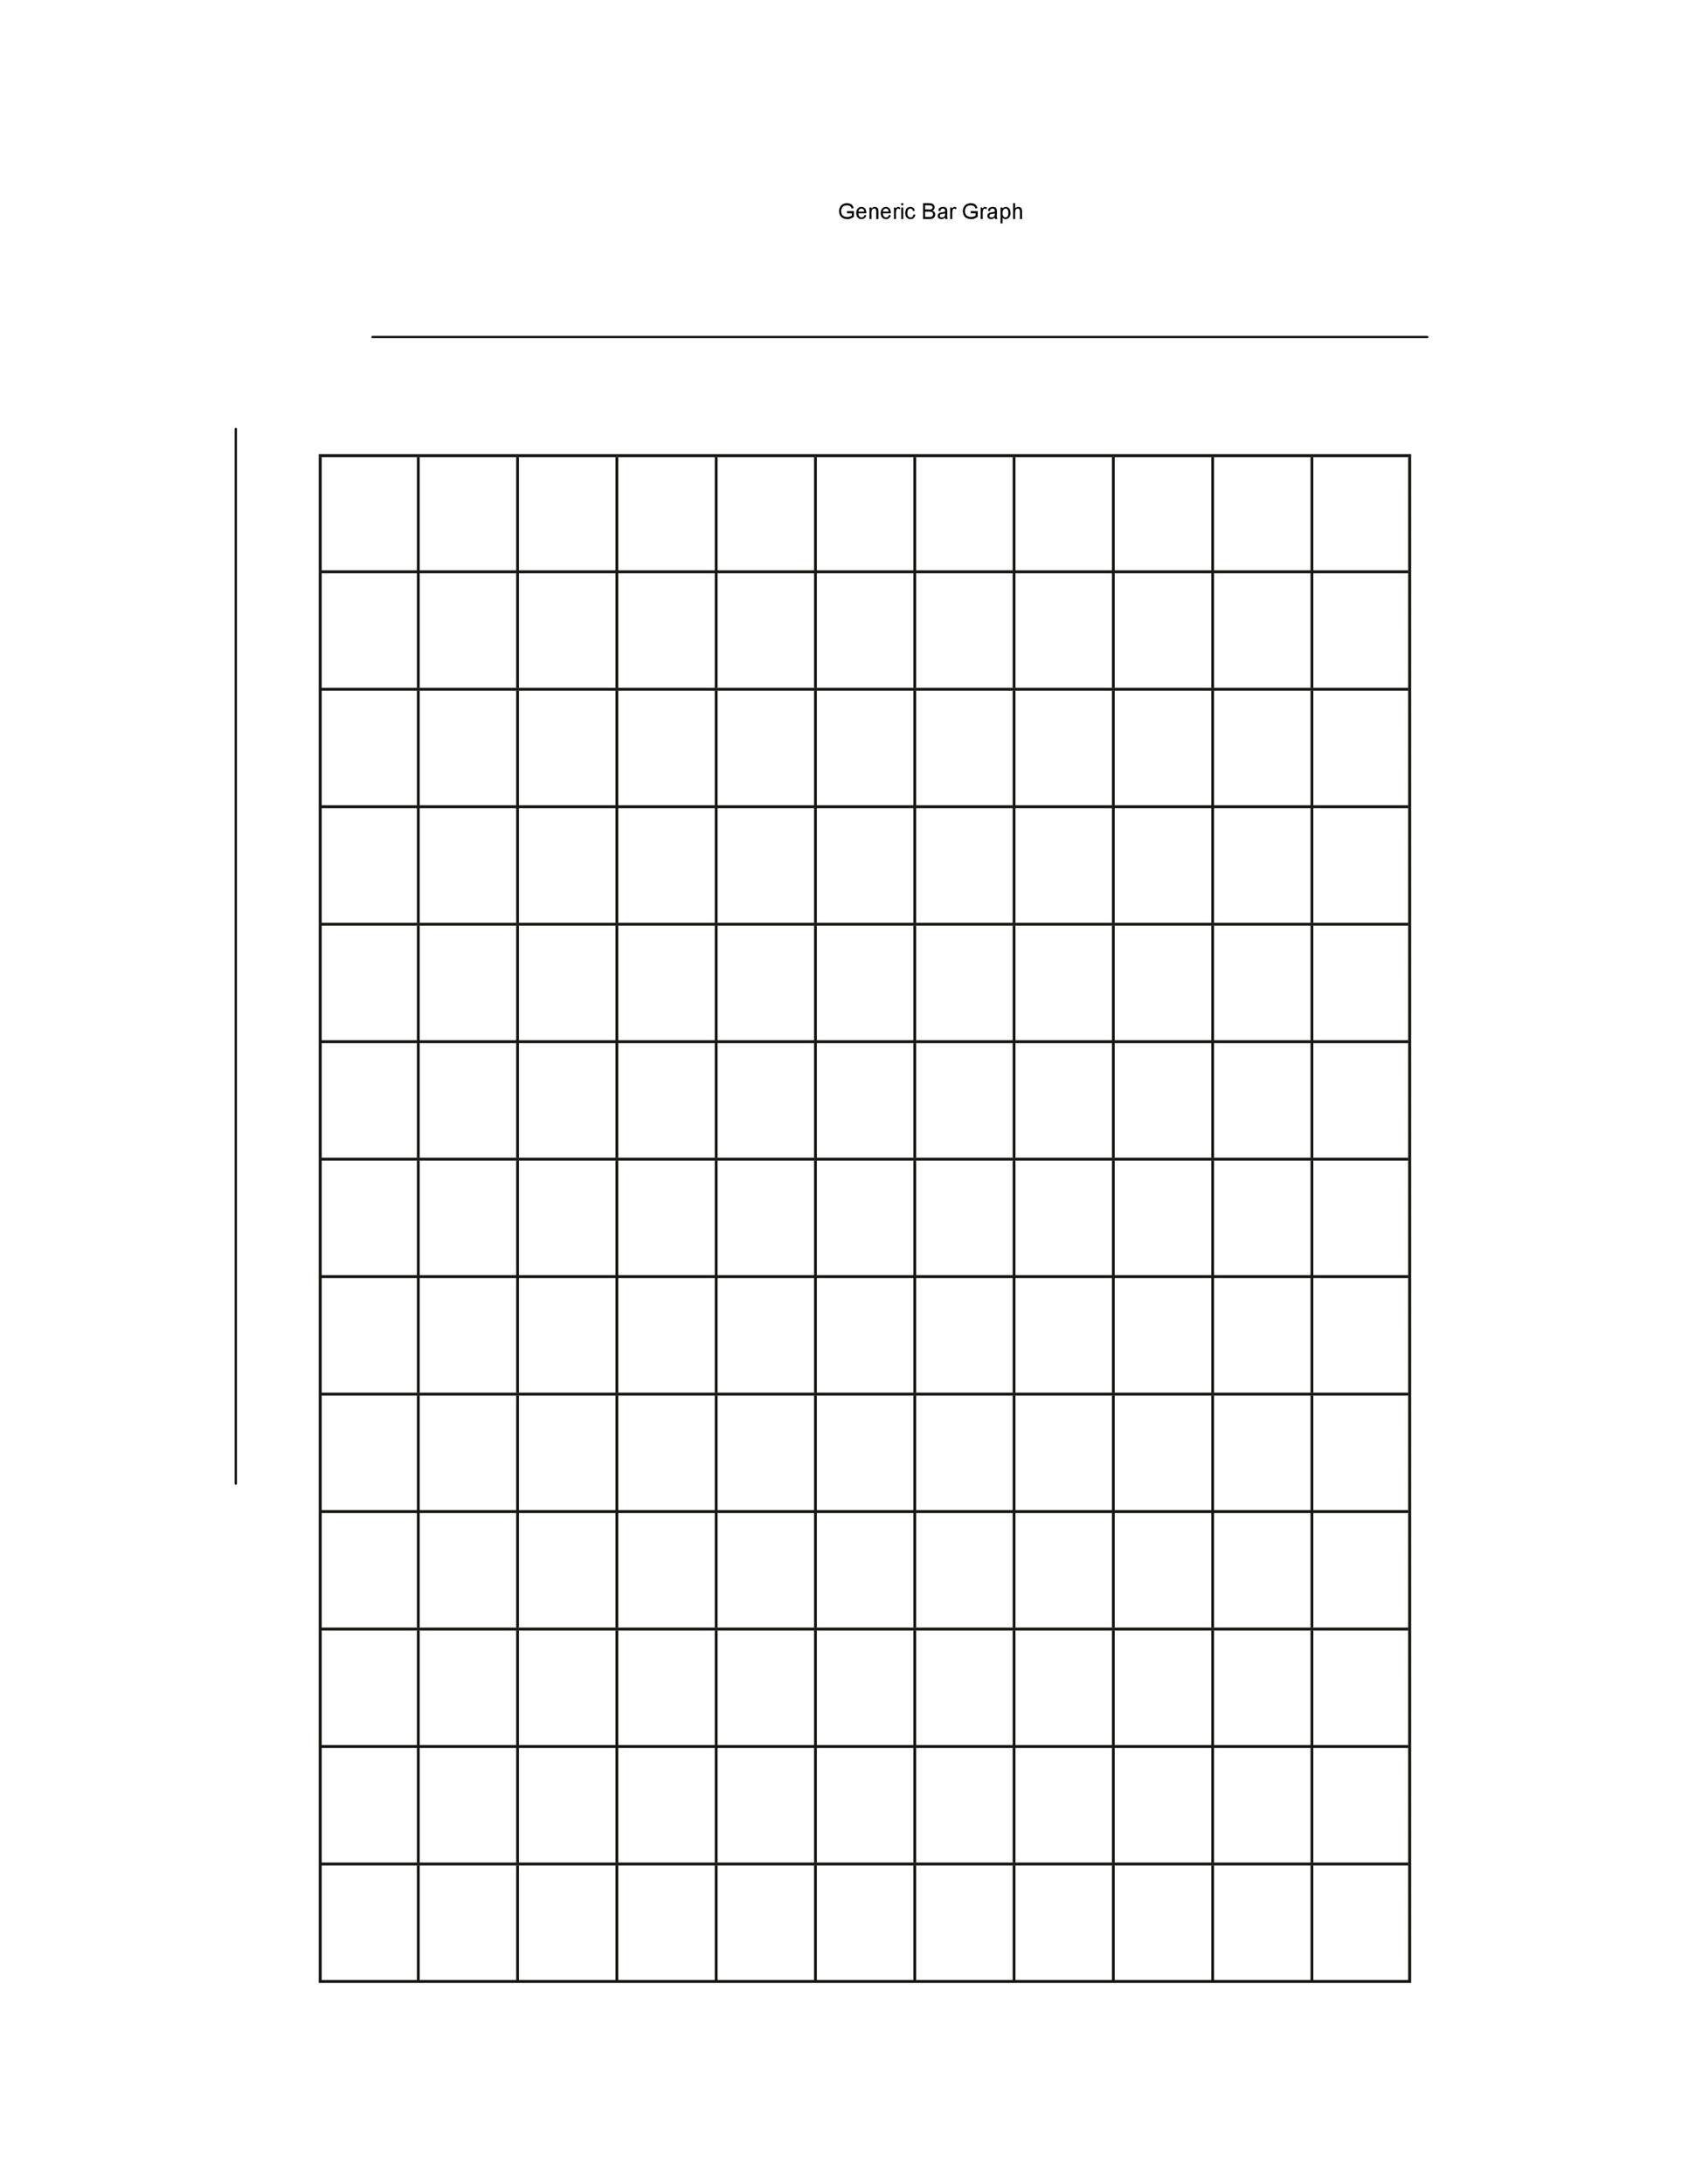 Double Bar Graphs Worksheet 41 Blank Bar Graph Templates